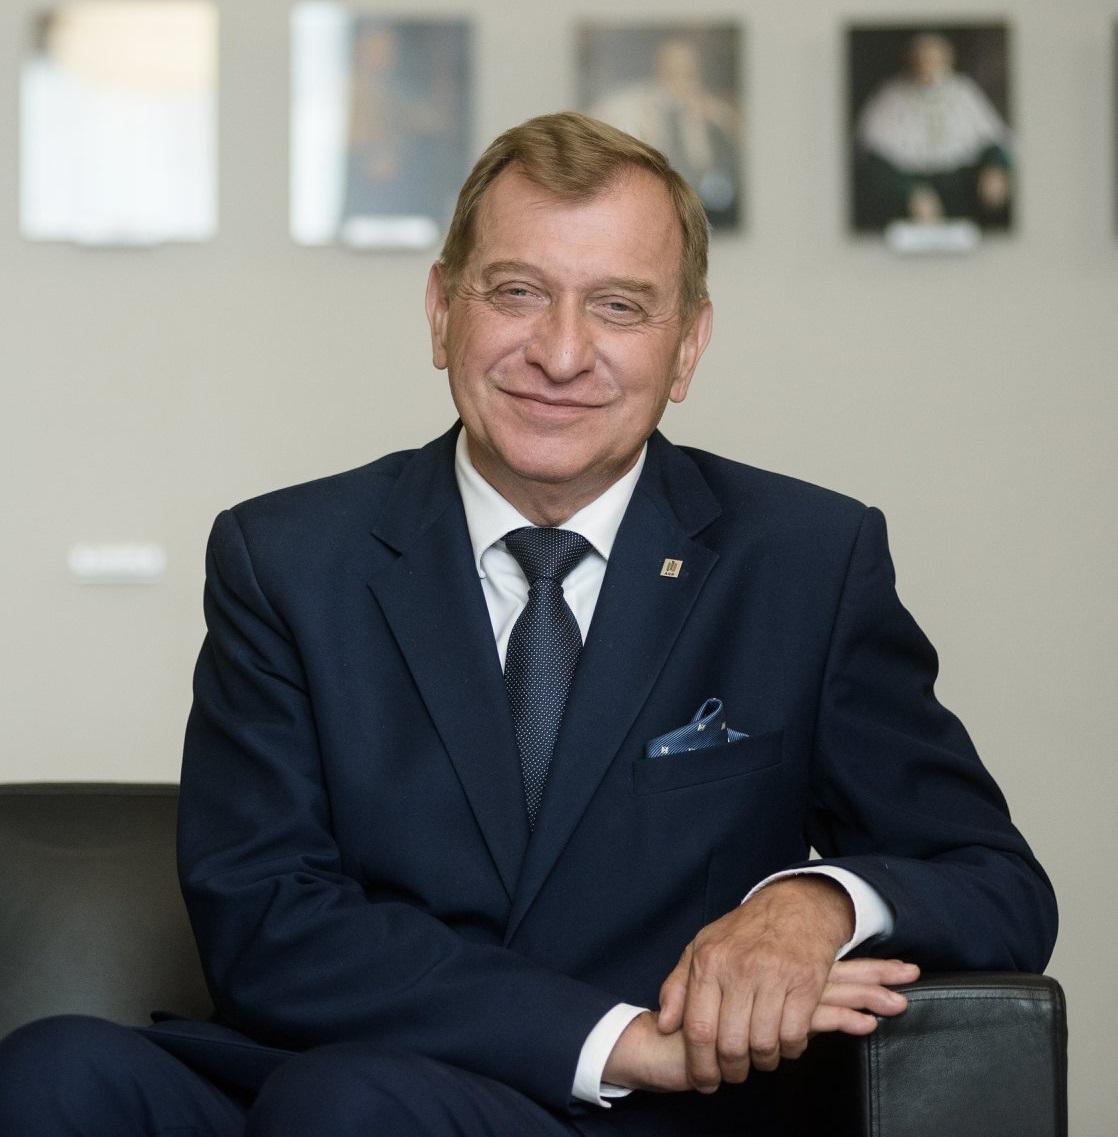 JM prof. dr hab. inż. Jerzy Lis